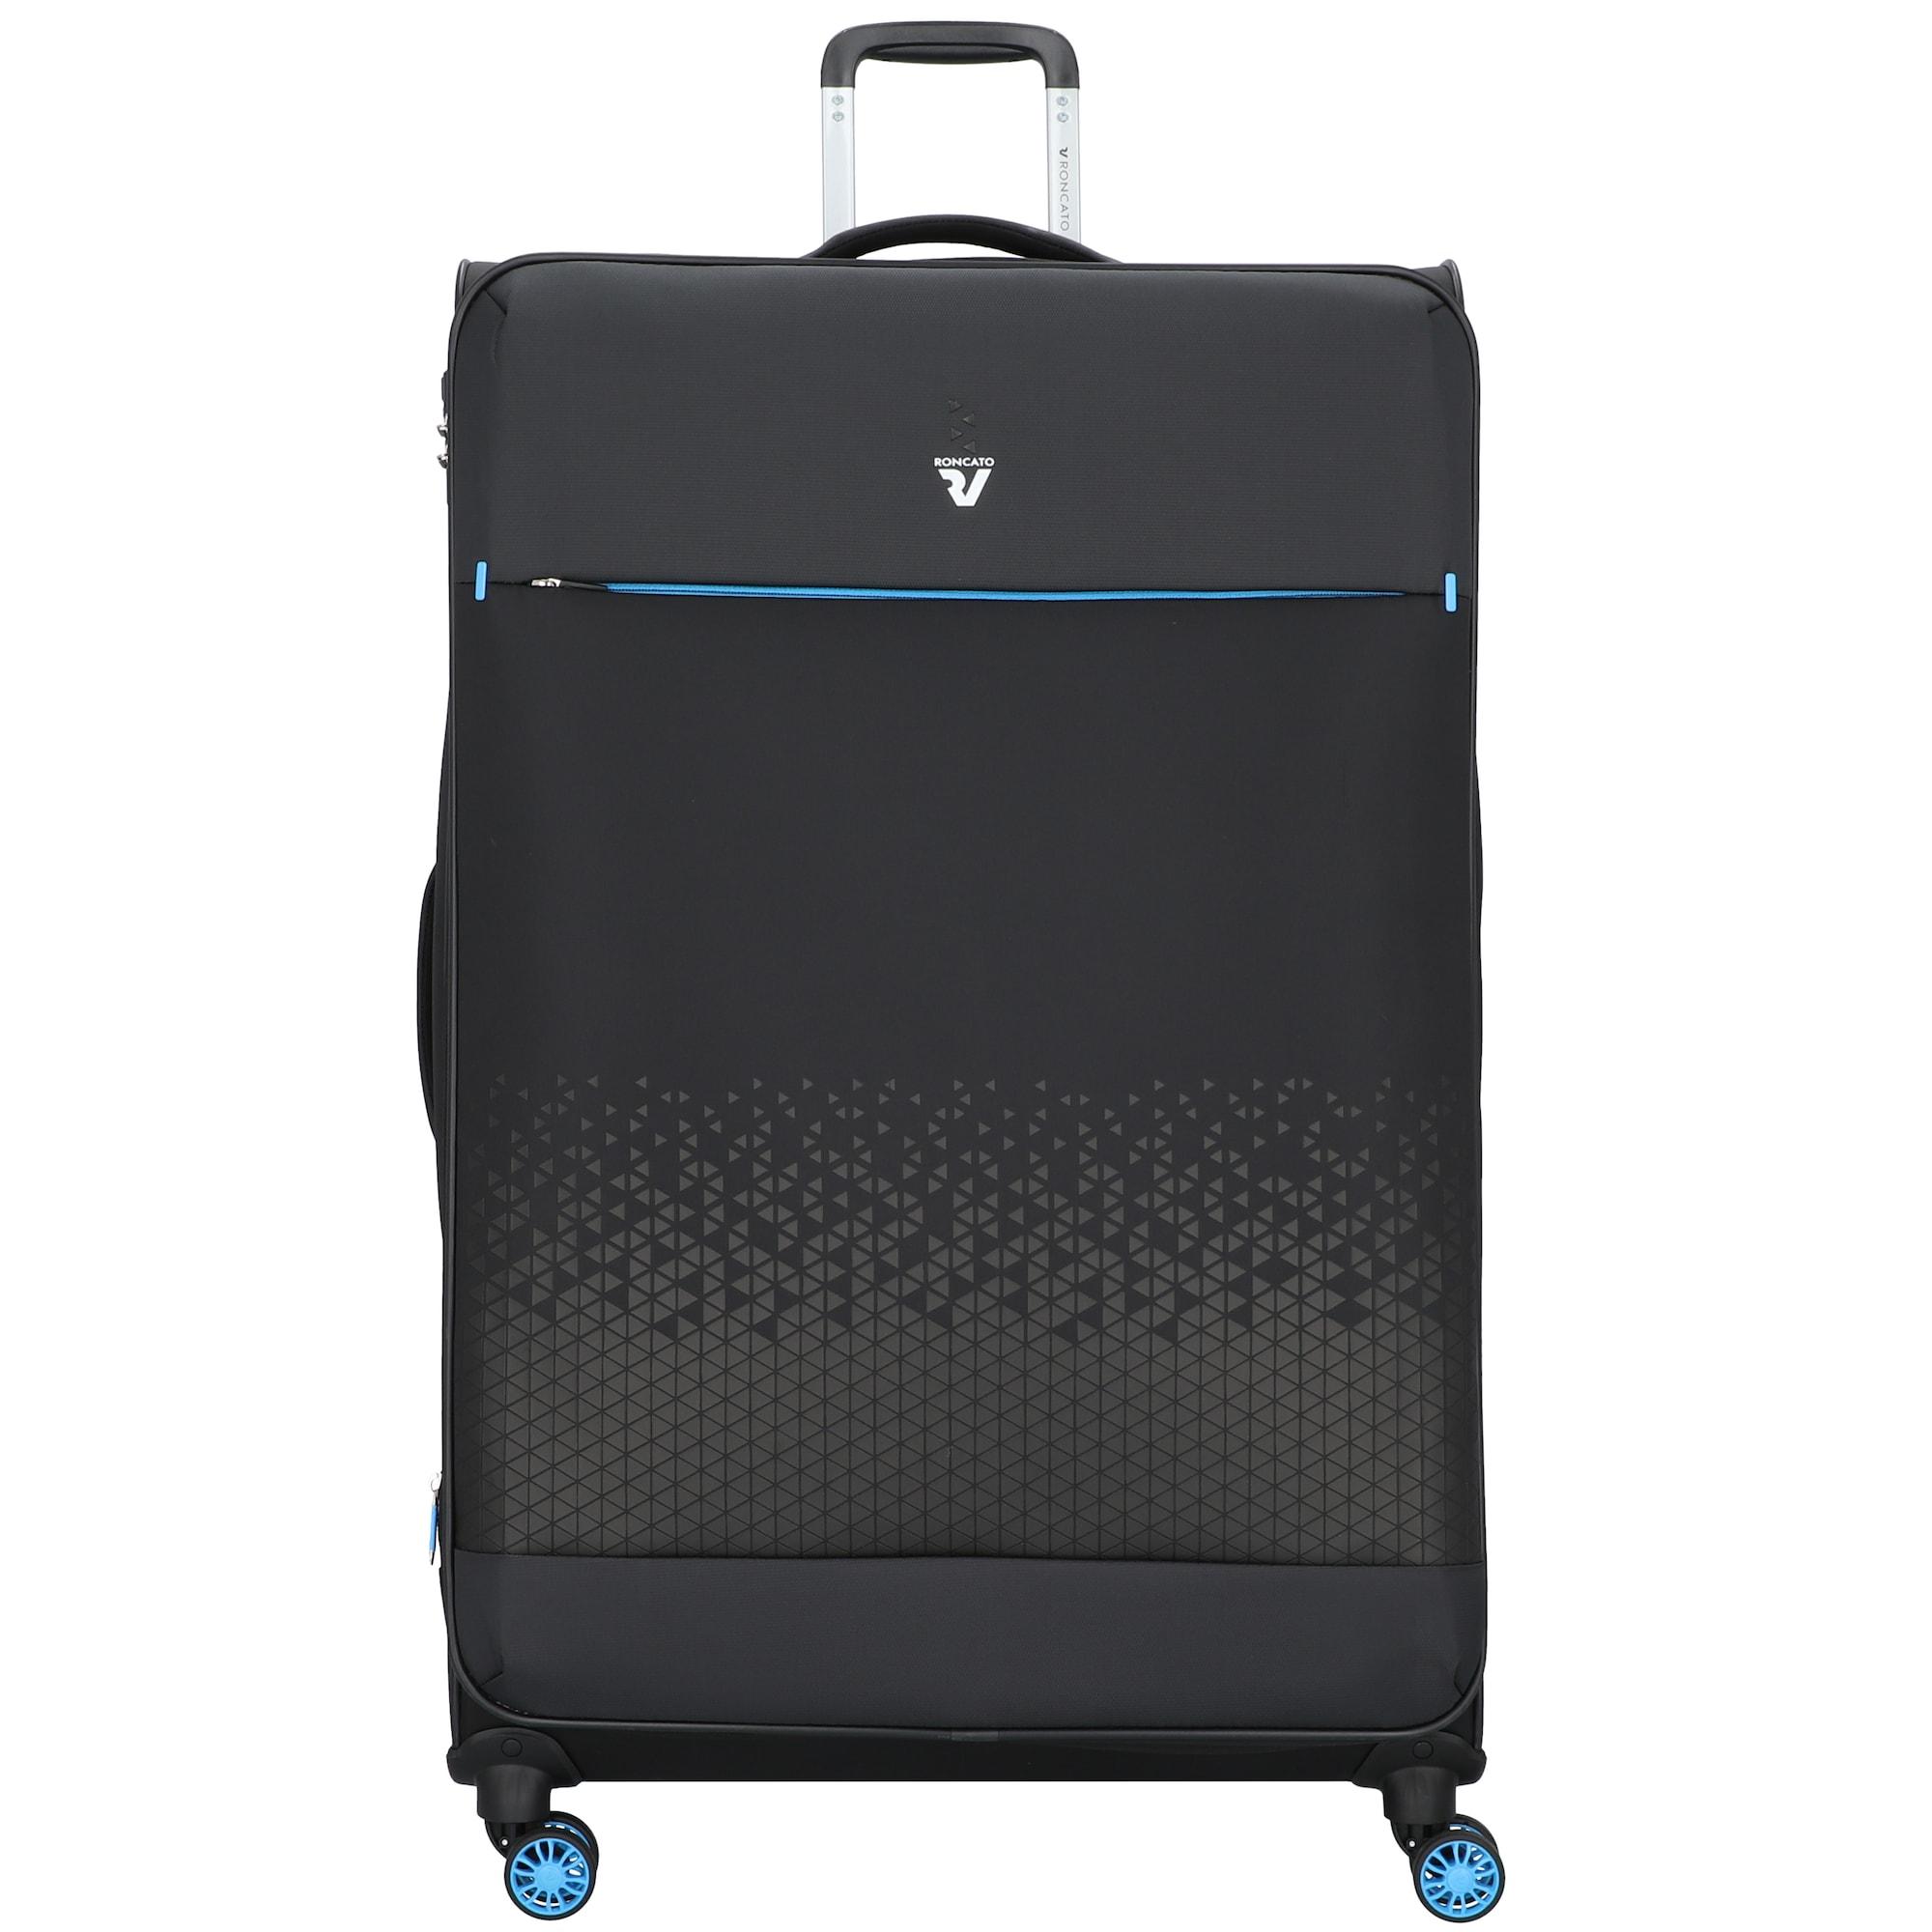 Koffer   Taschen > Koffer & Trolleys > Sonstige Koffer   Roncato